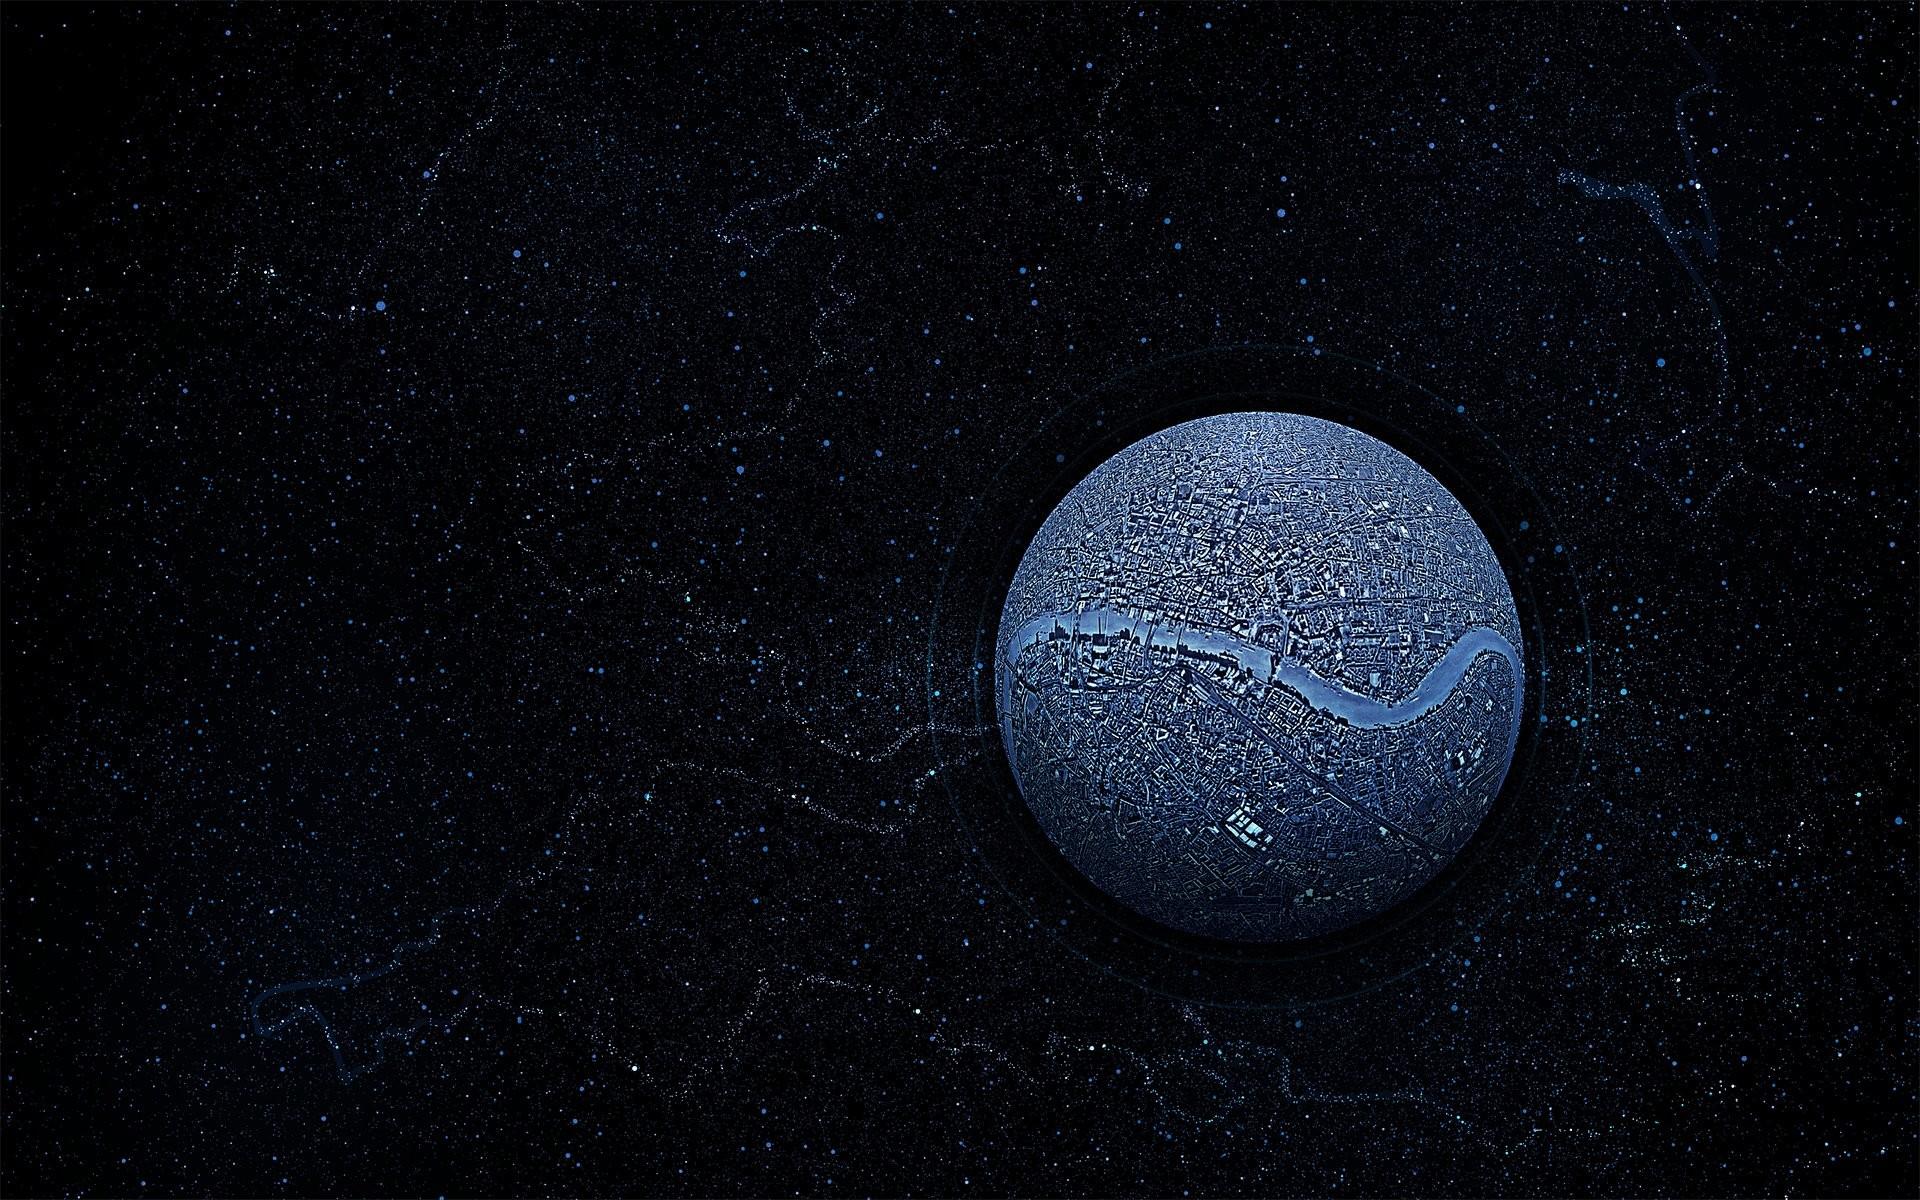 Cool London Planet Laptop Desktop Backgrounds Backgrounds Computer Images